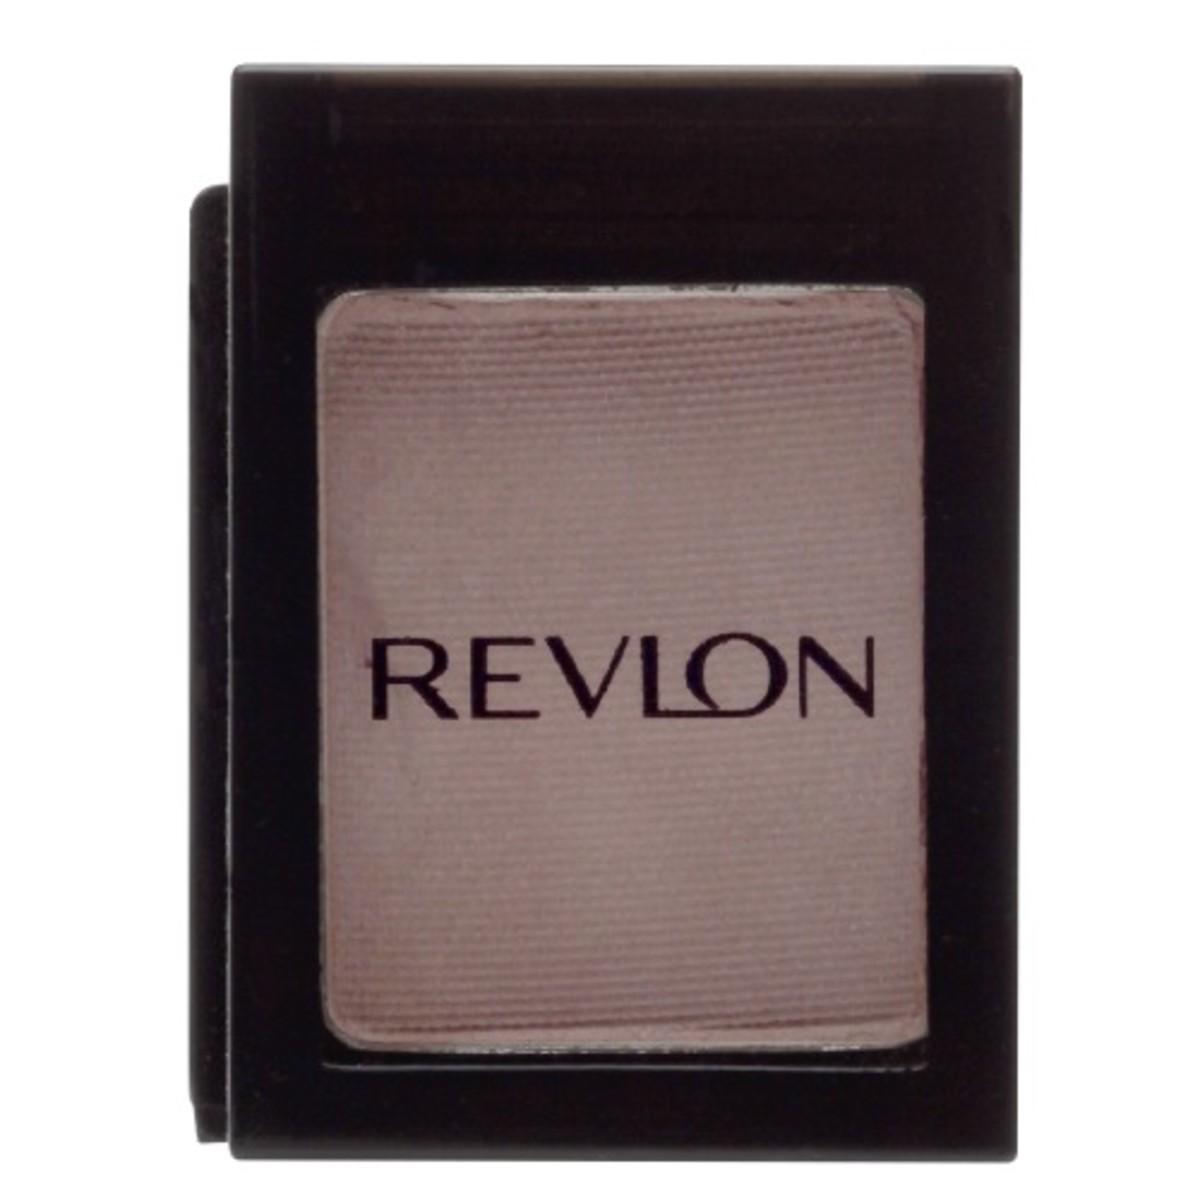 Revlon ColorStay ShadowLinks in Chocolate